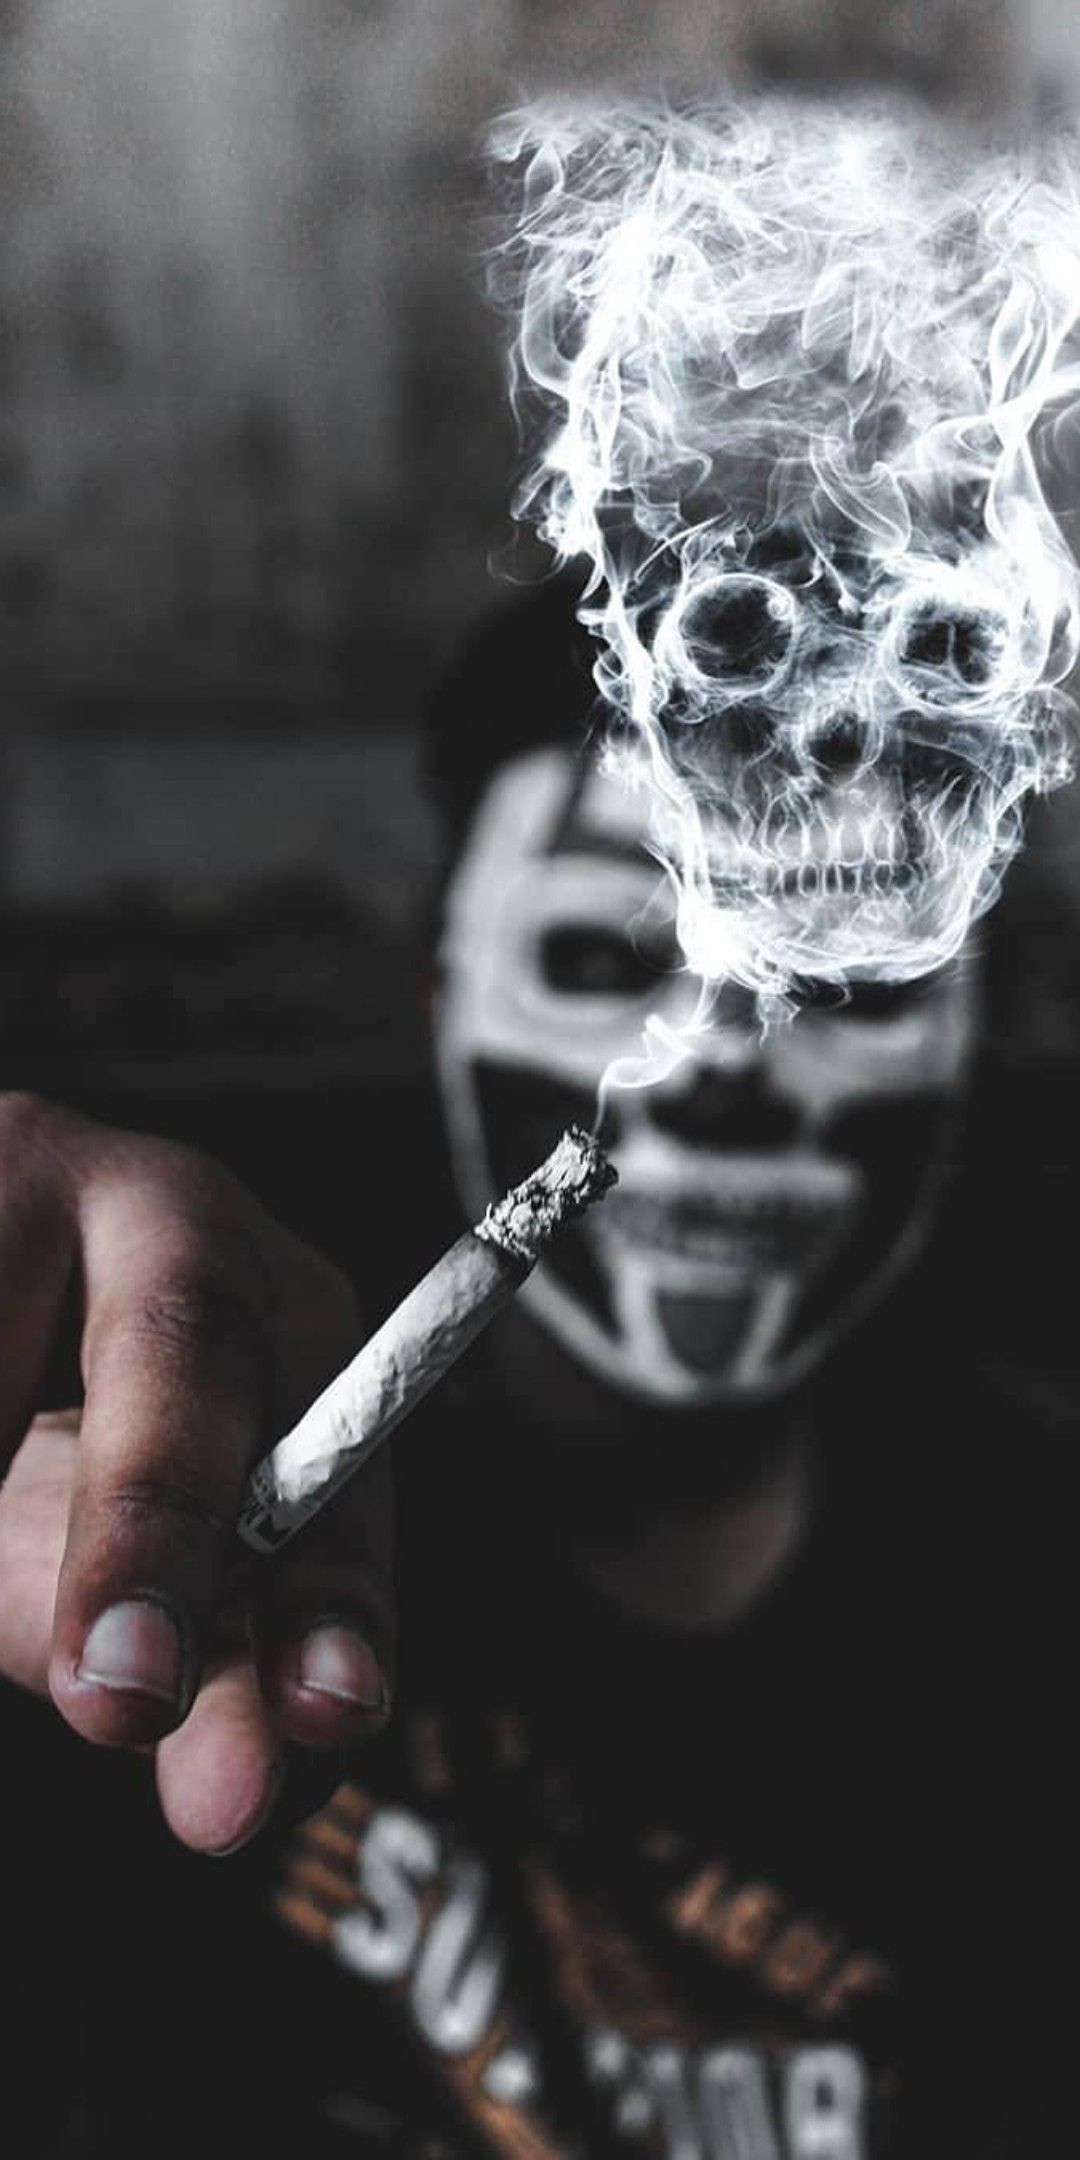 Pin By Kierstin Lapatka On Videos Parejas Smoke Art Background Wallpaper For Photoshop Smoke Pictures